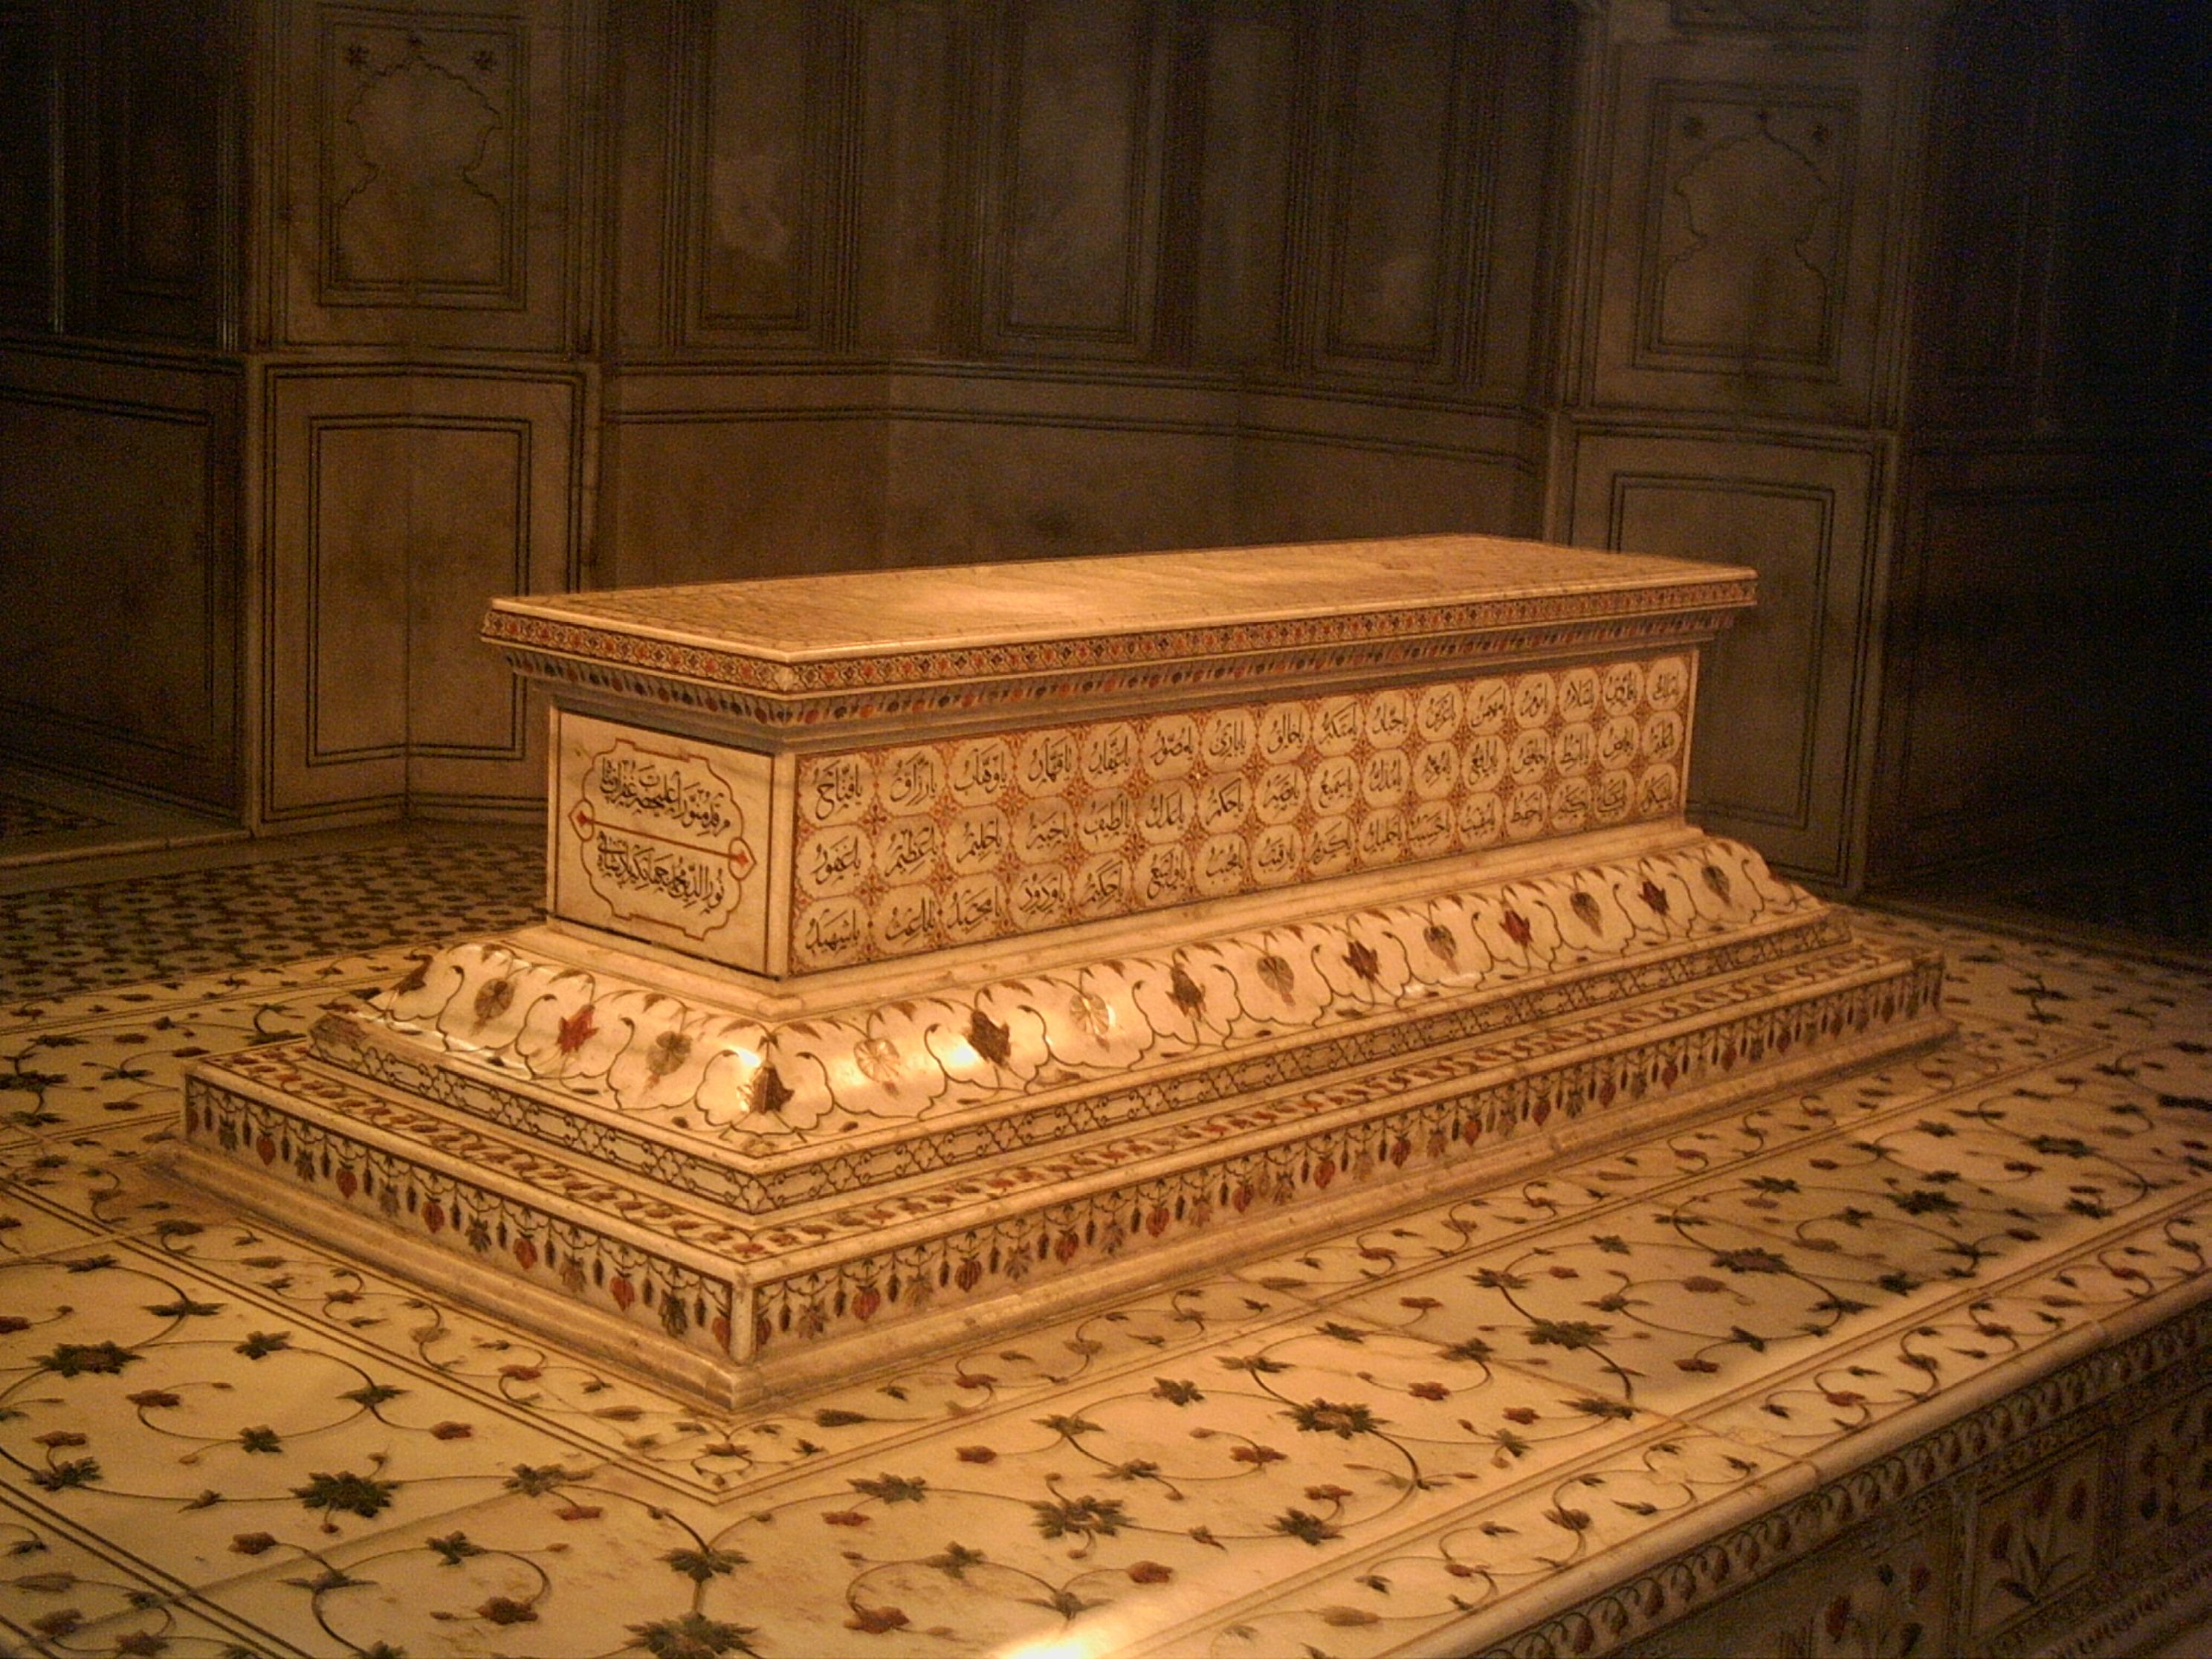 Filejehangir Tomb Jpg Wikimedia Commons